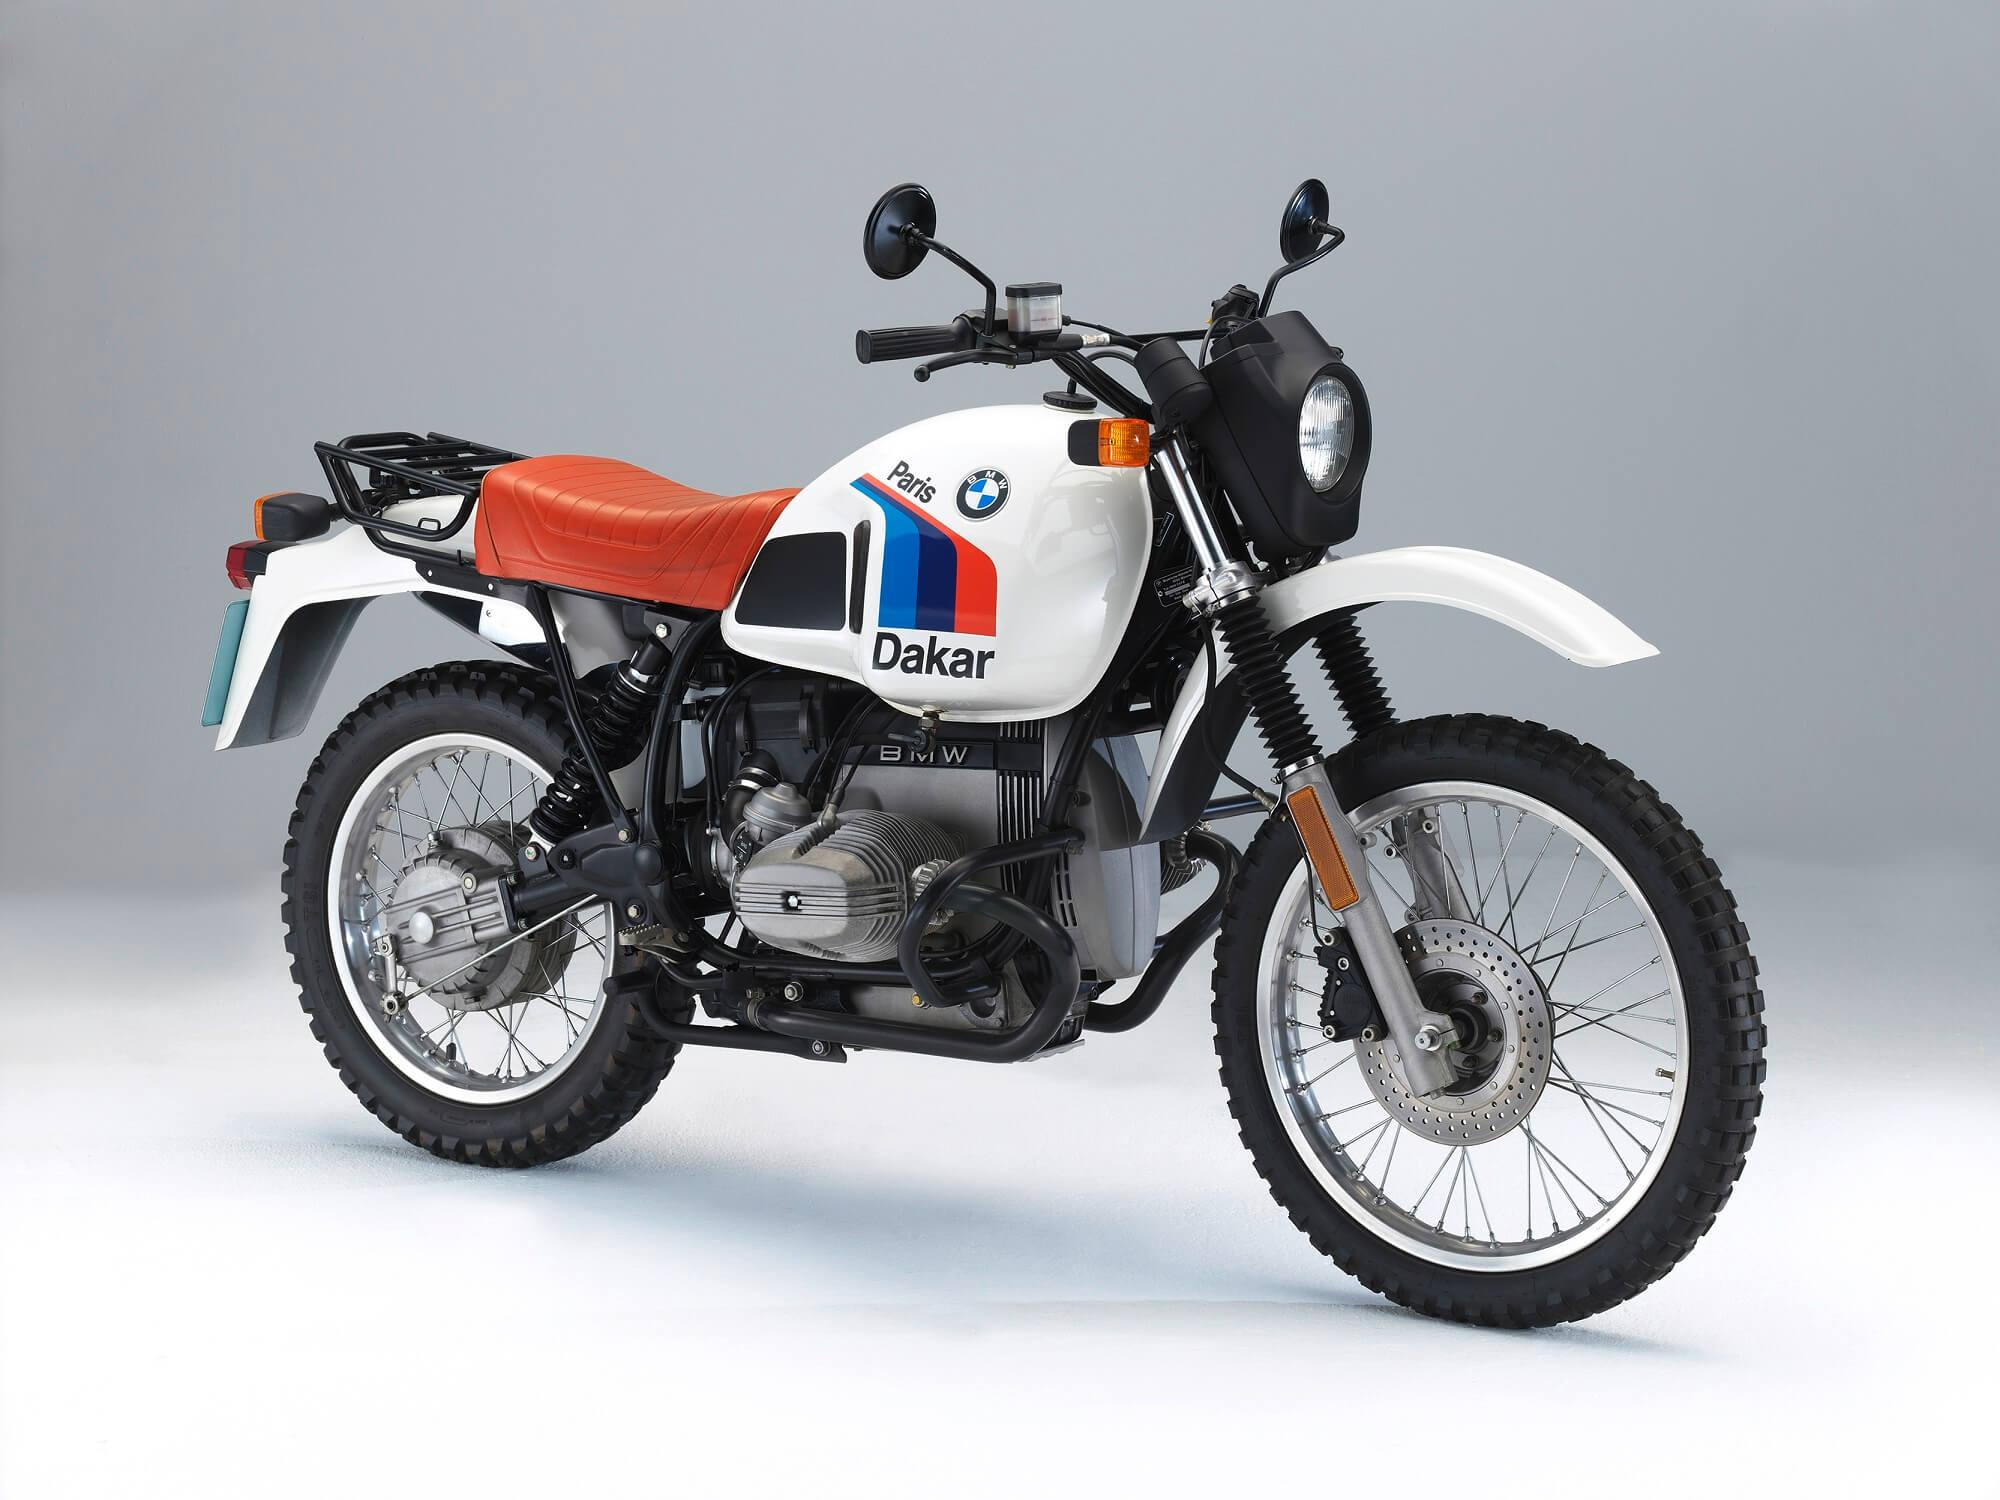 BMW R80 G/S